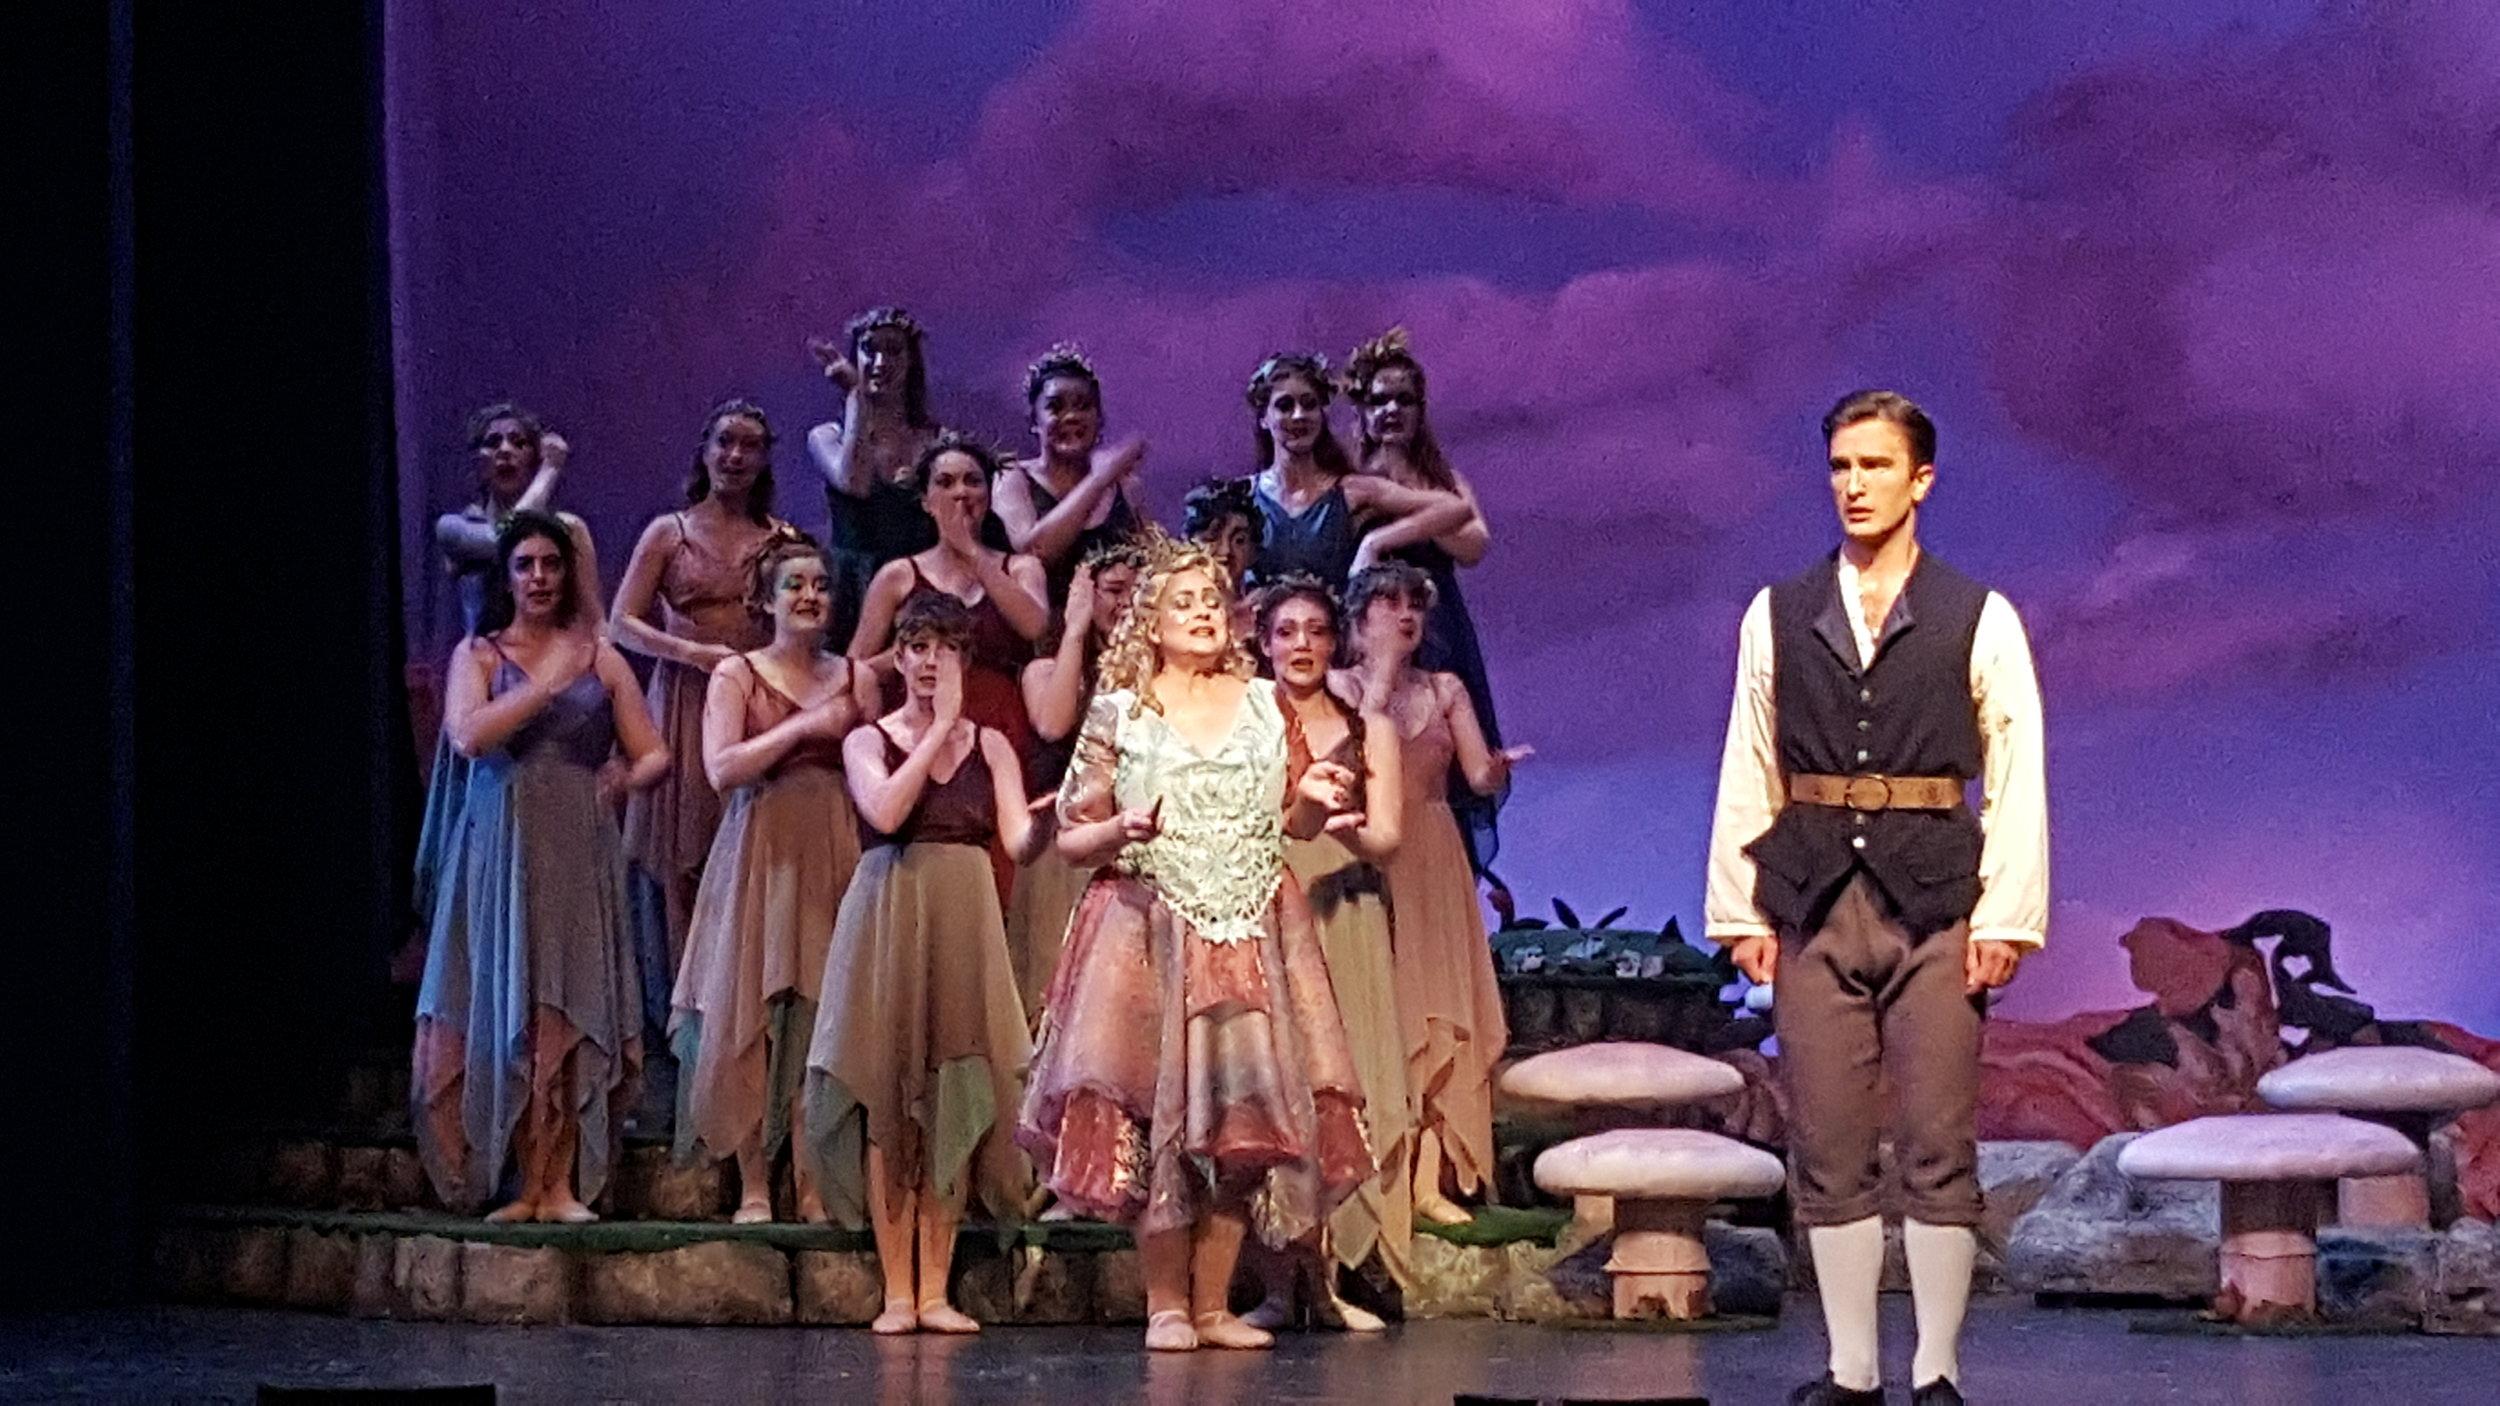 Strephon and the Fairies